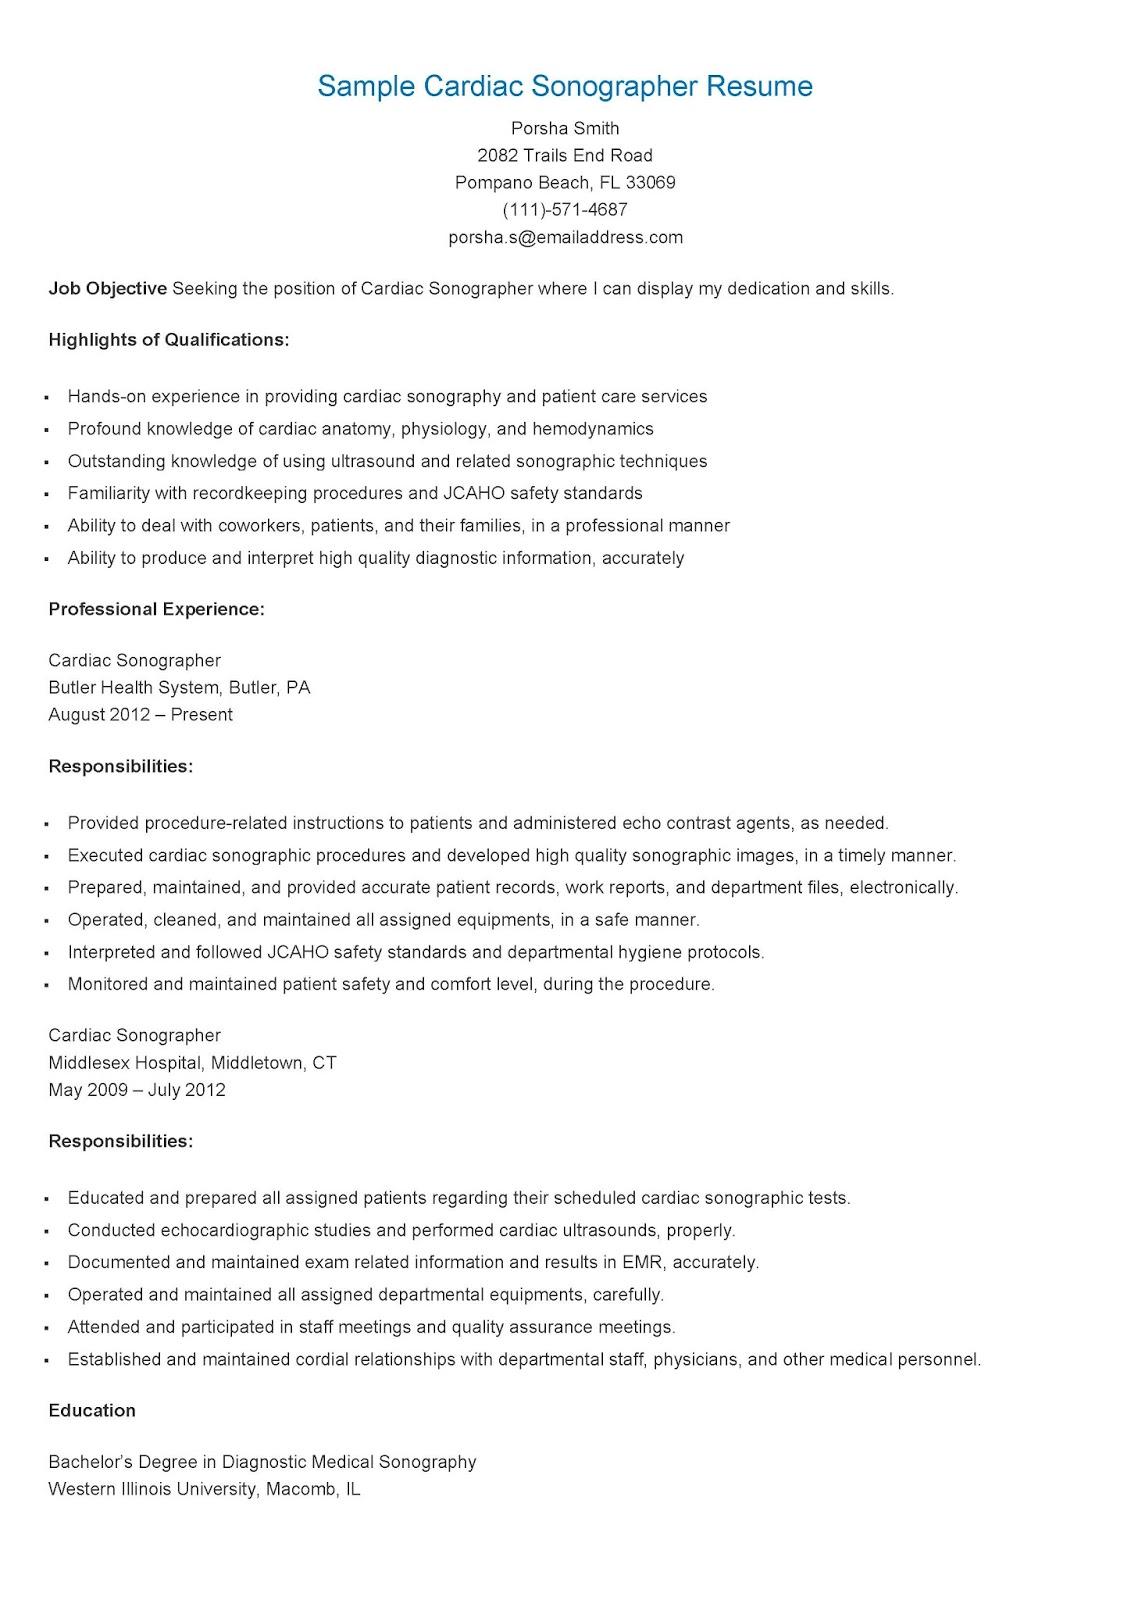 resume sles sle cardiac sonographer resume